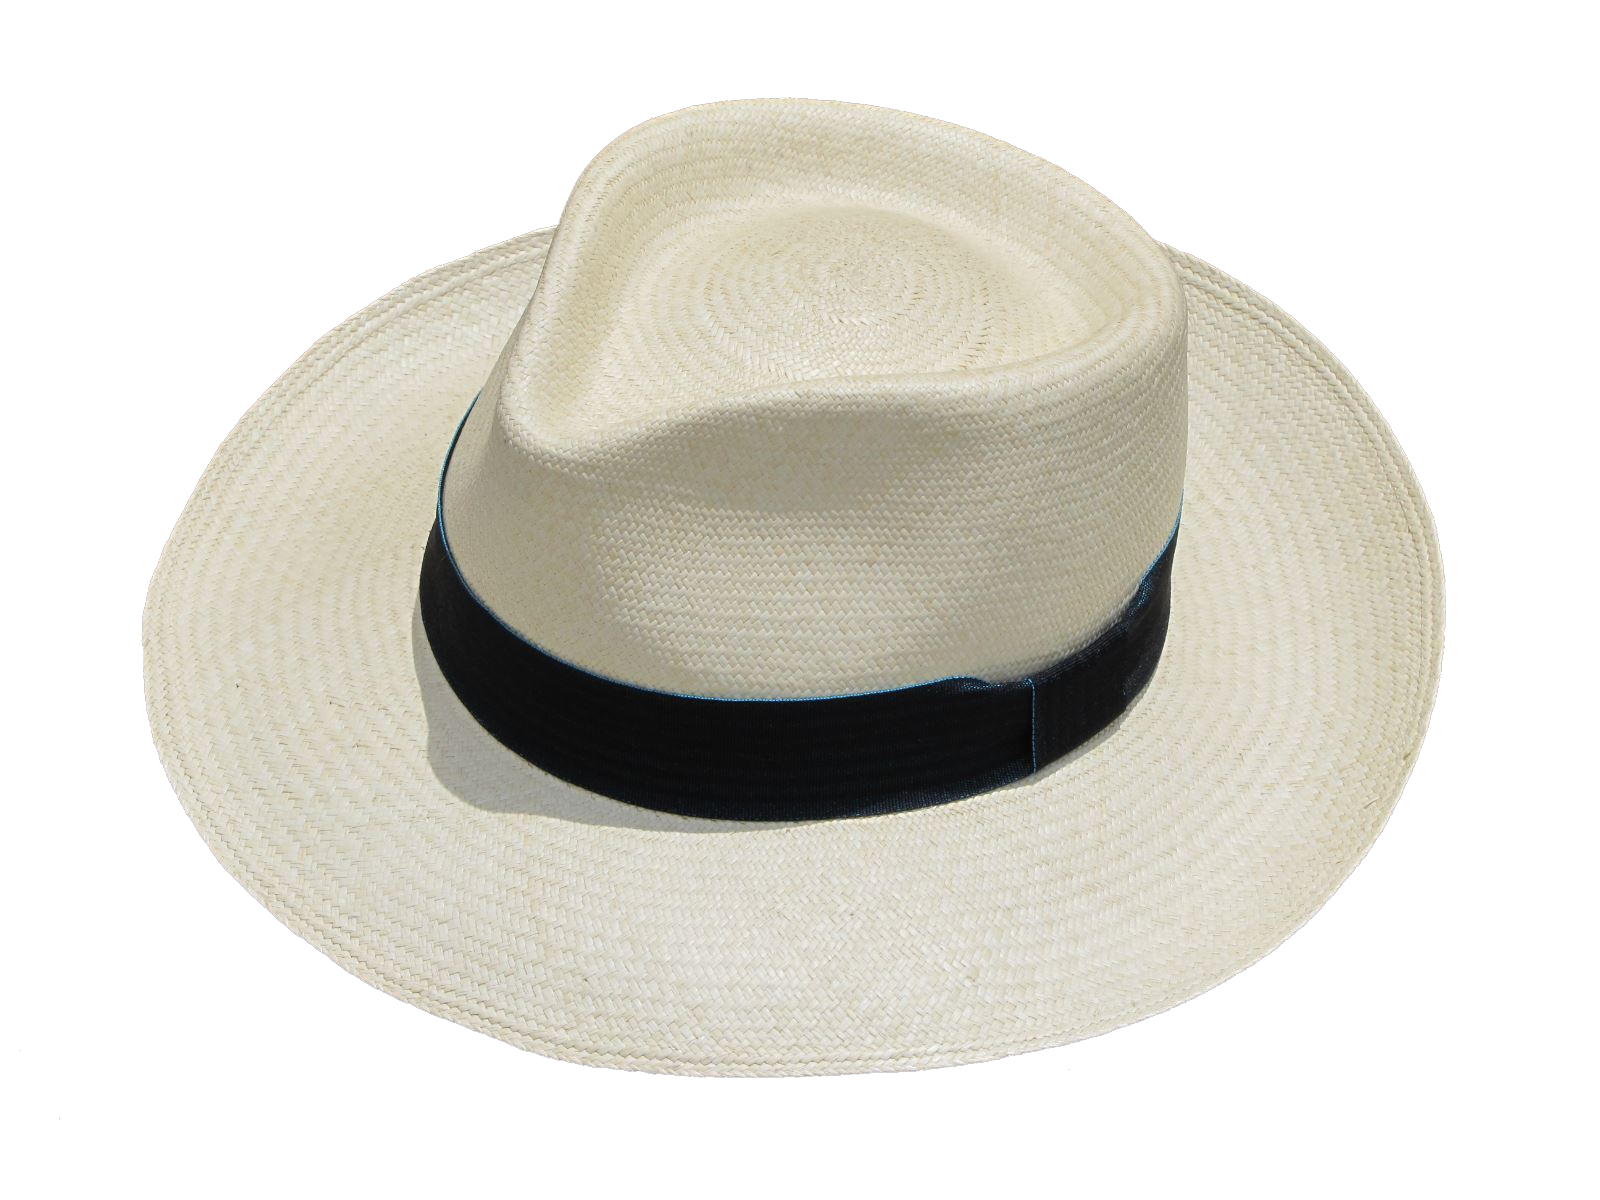 a9a2c5bccb9 Panama hat Havana subfino